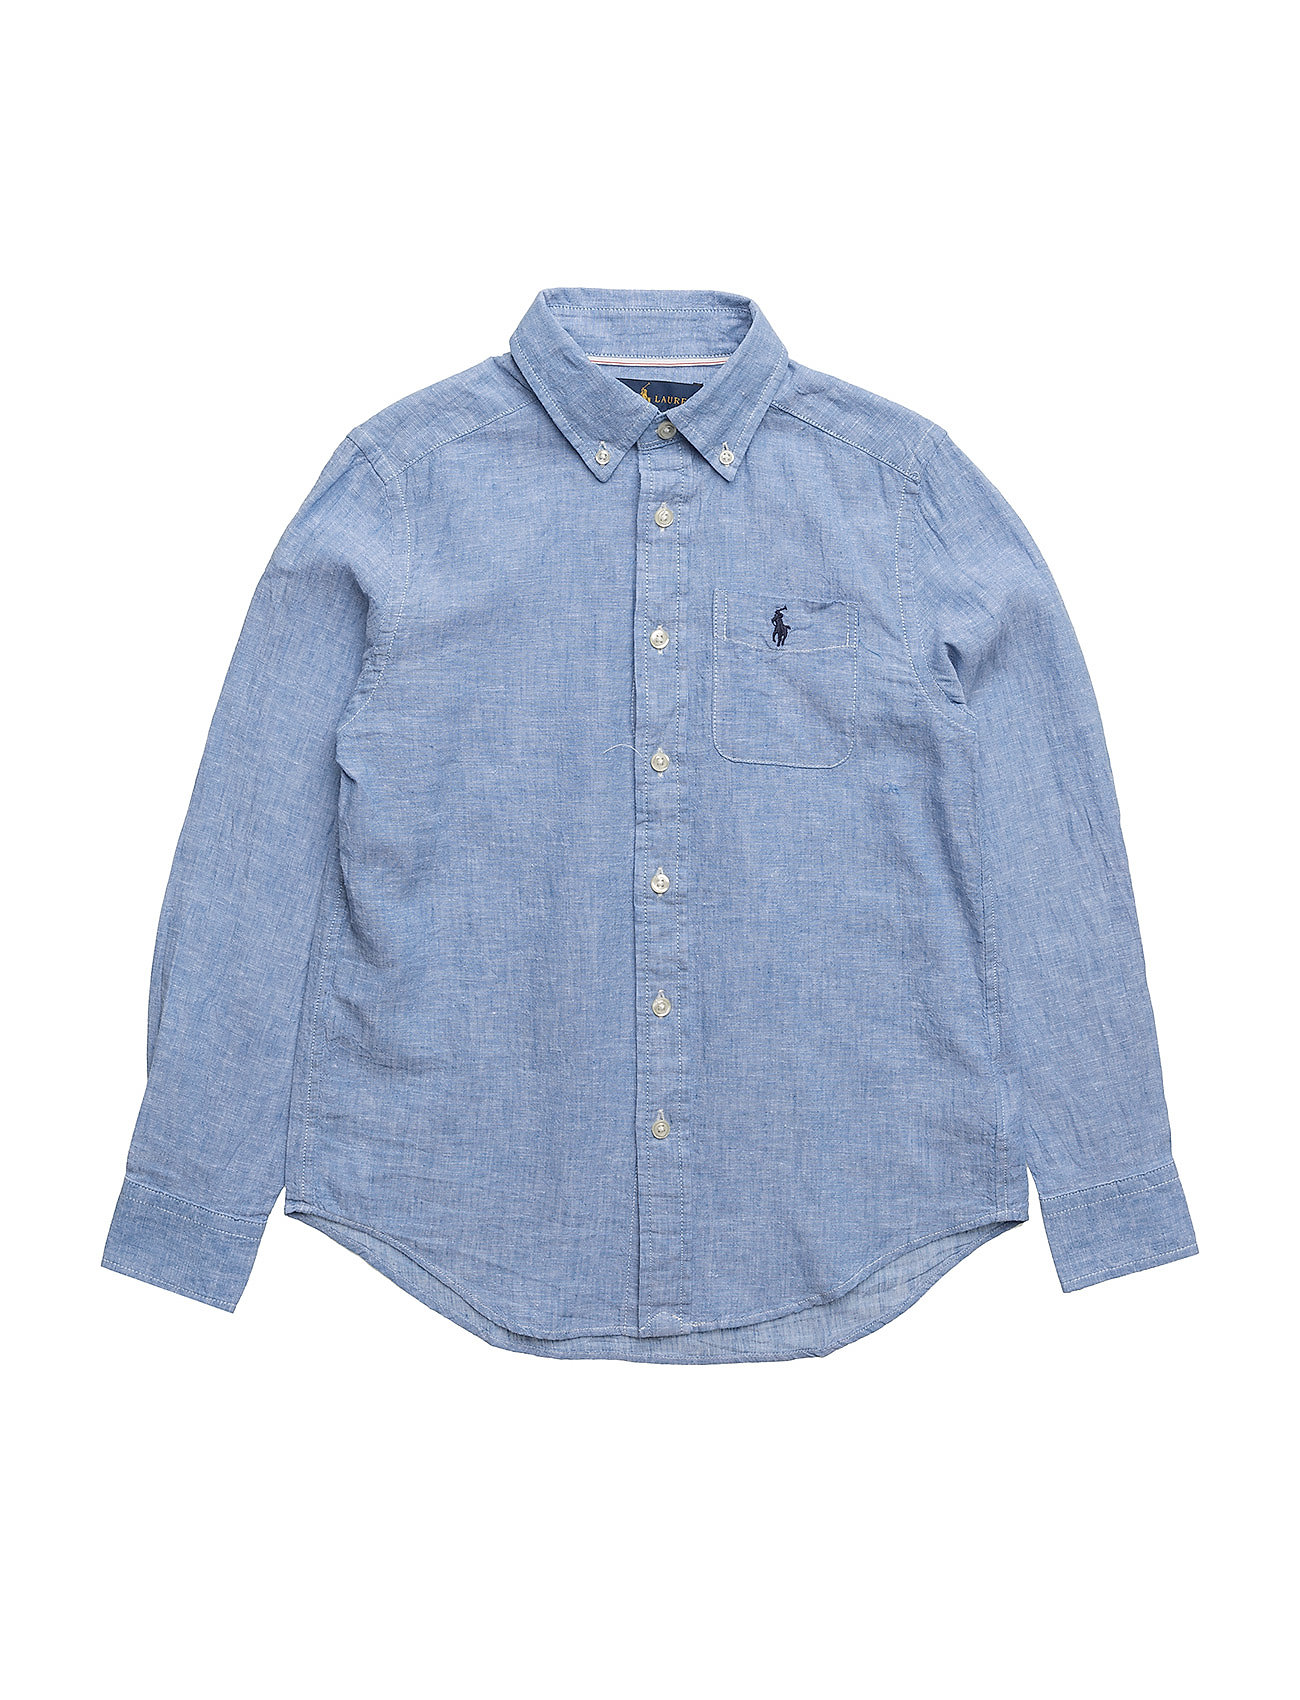 Linen cotton chambray shirt light blue 79 ralph for Chambray shirt for kids